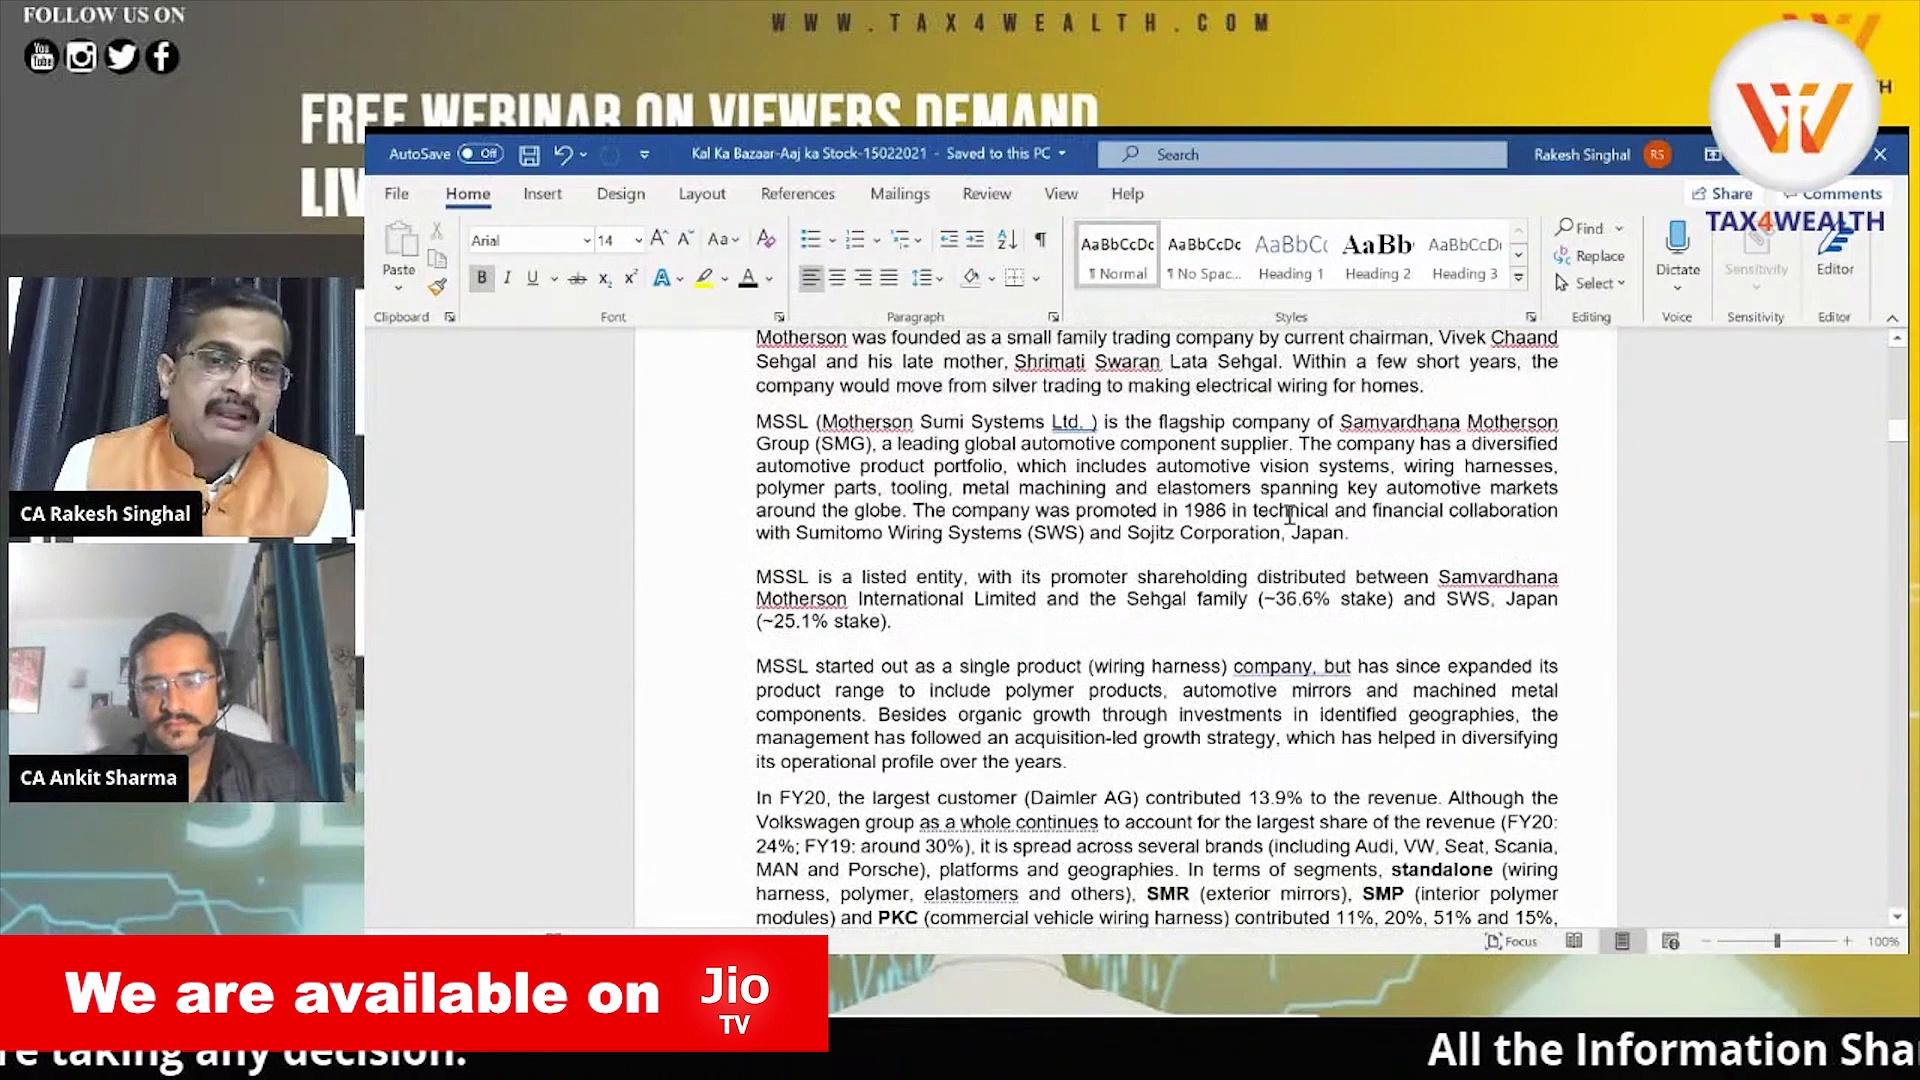 Motherson sumi Systems ke stock main kya karein with CA Rakesh Singhal